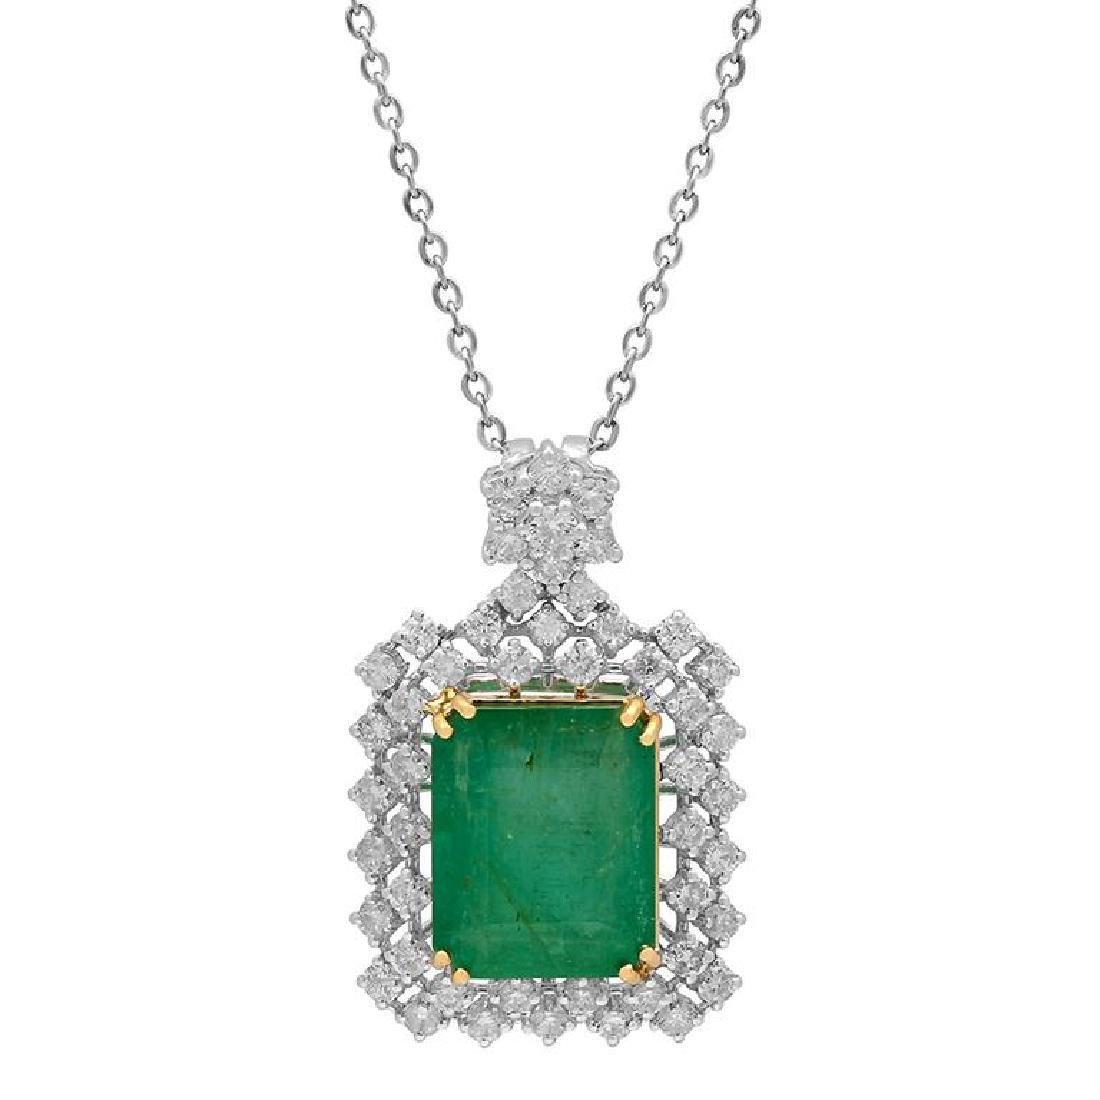 14k White Gold 9.41ct Emerald 1.96ct Diamond Pendant